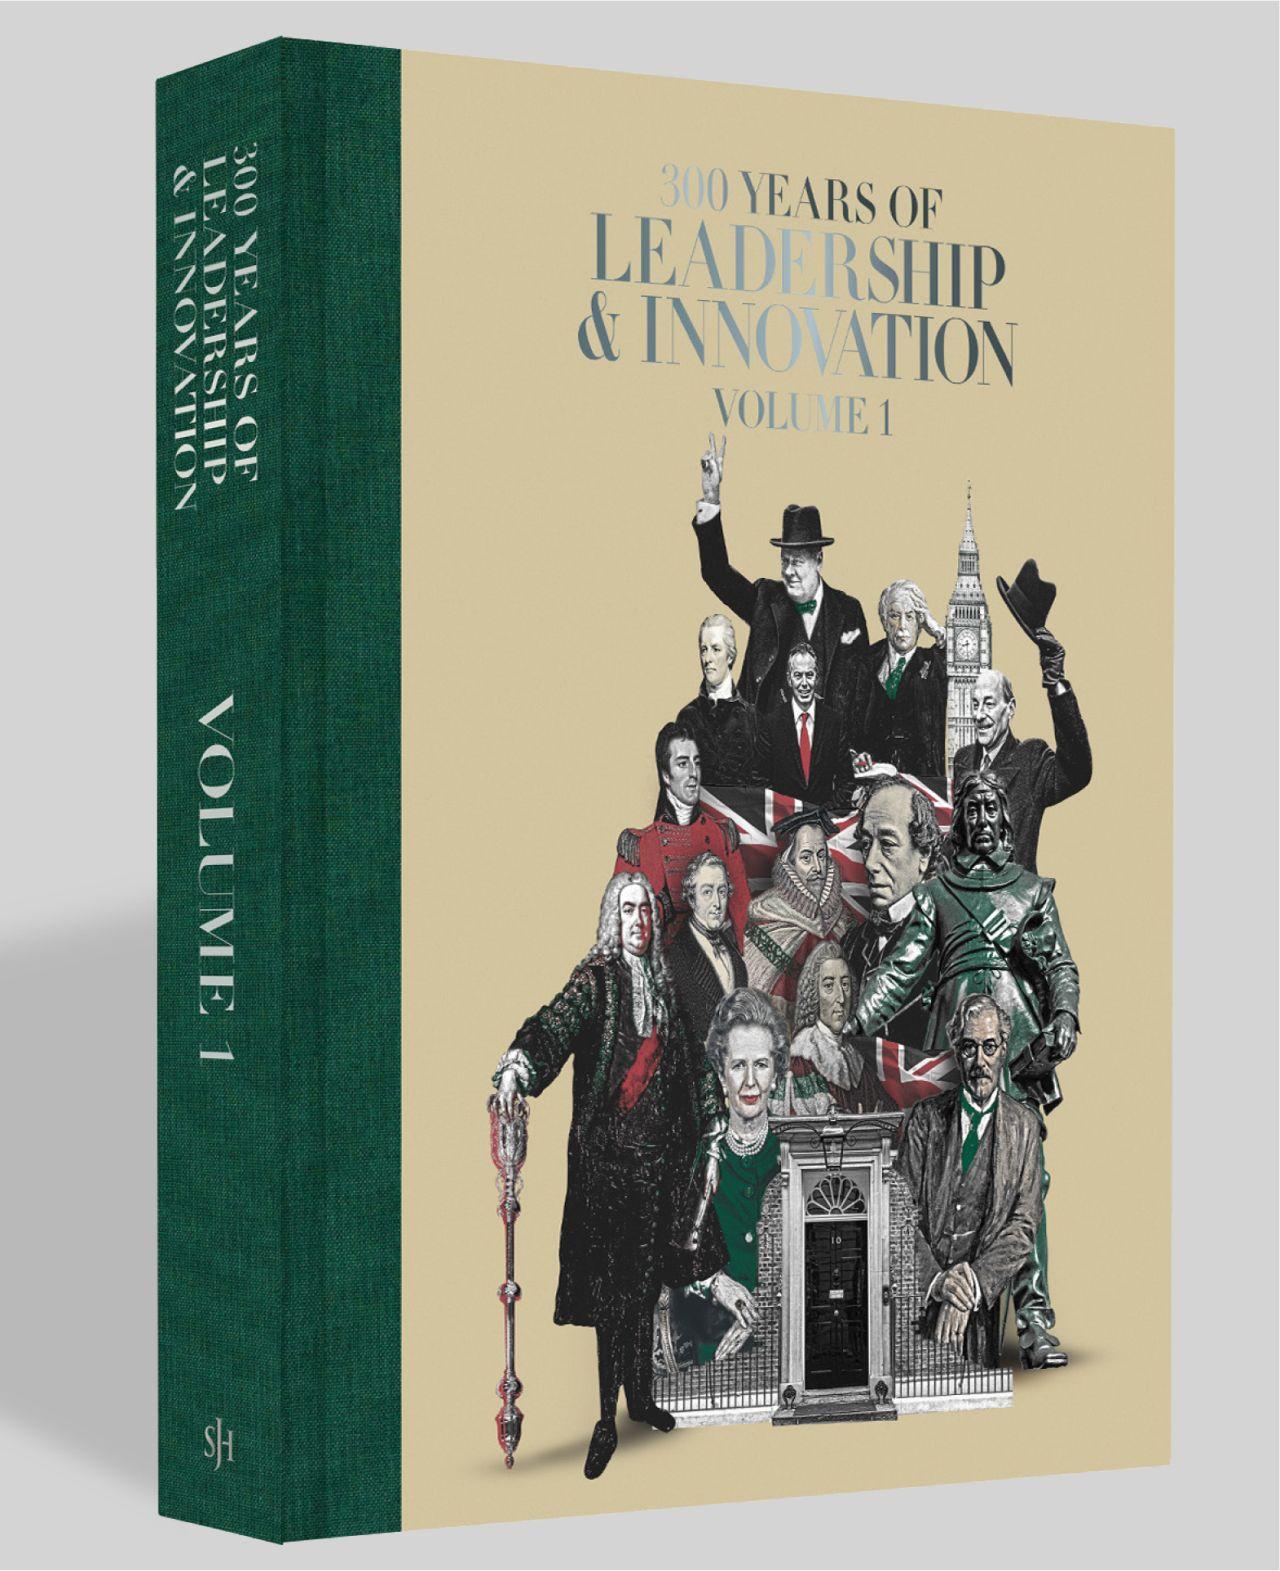 300 years of Leadership & Innovation